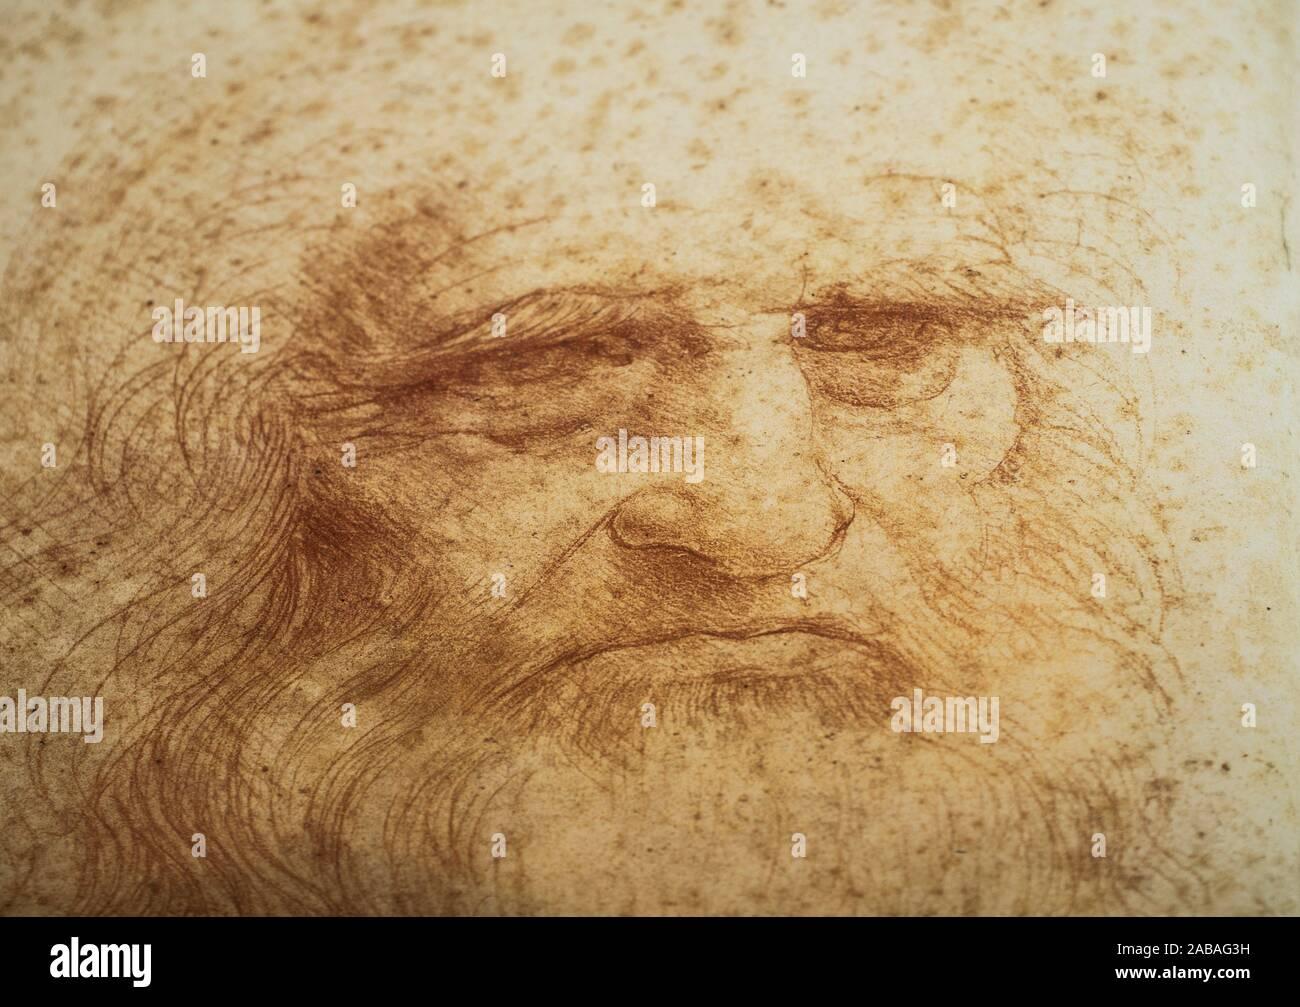 Leonardo da Vinci, Italian polymath of the Renaissance. Self Portrait in Red chalk, Turin Royal LIbrary. Stock Photo